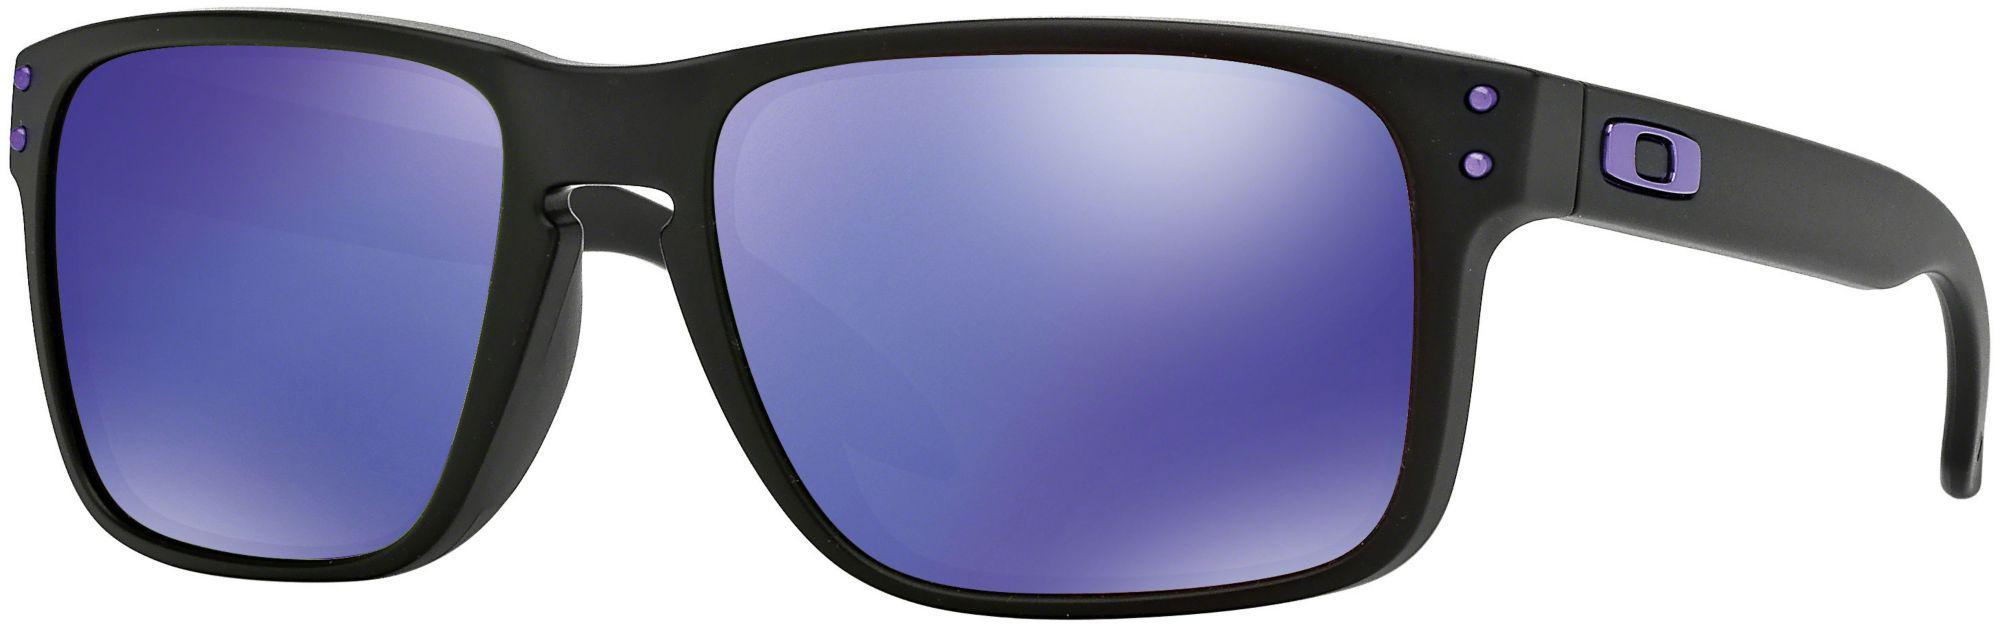 1cdee6c7dad Lyst - Oakley Holbrook Julian Wilson Signature Series Sunglasses in ...